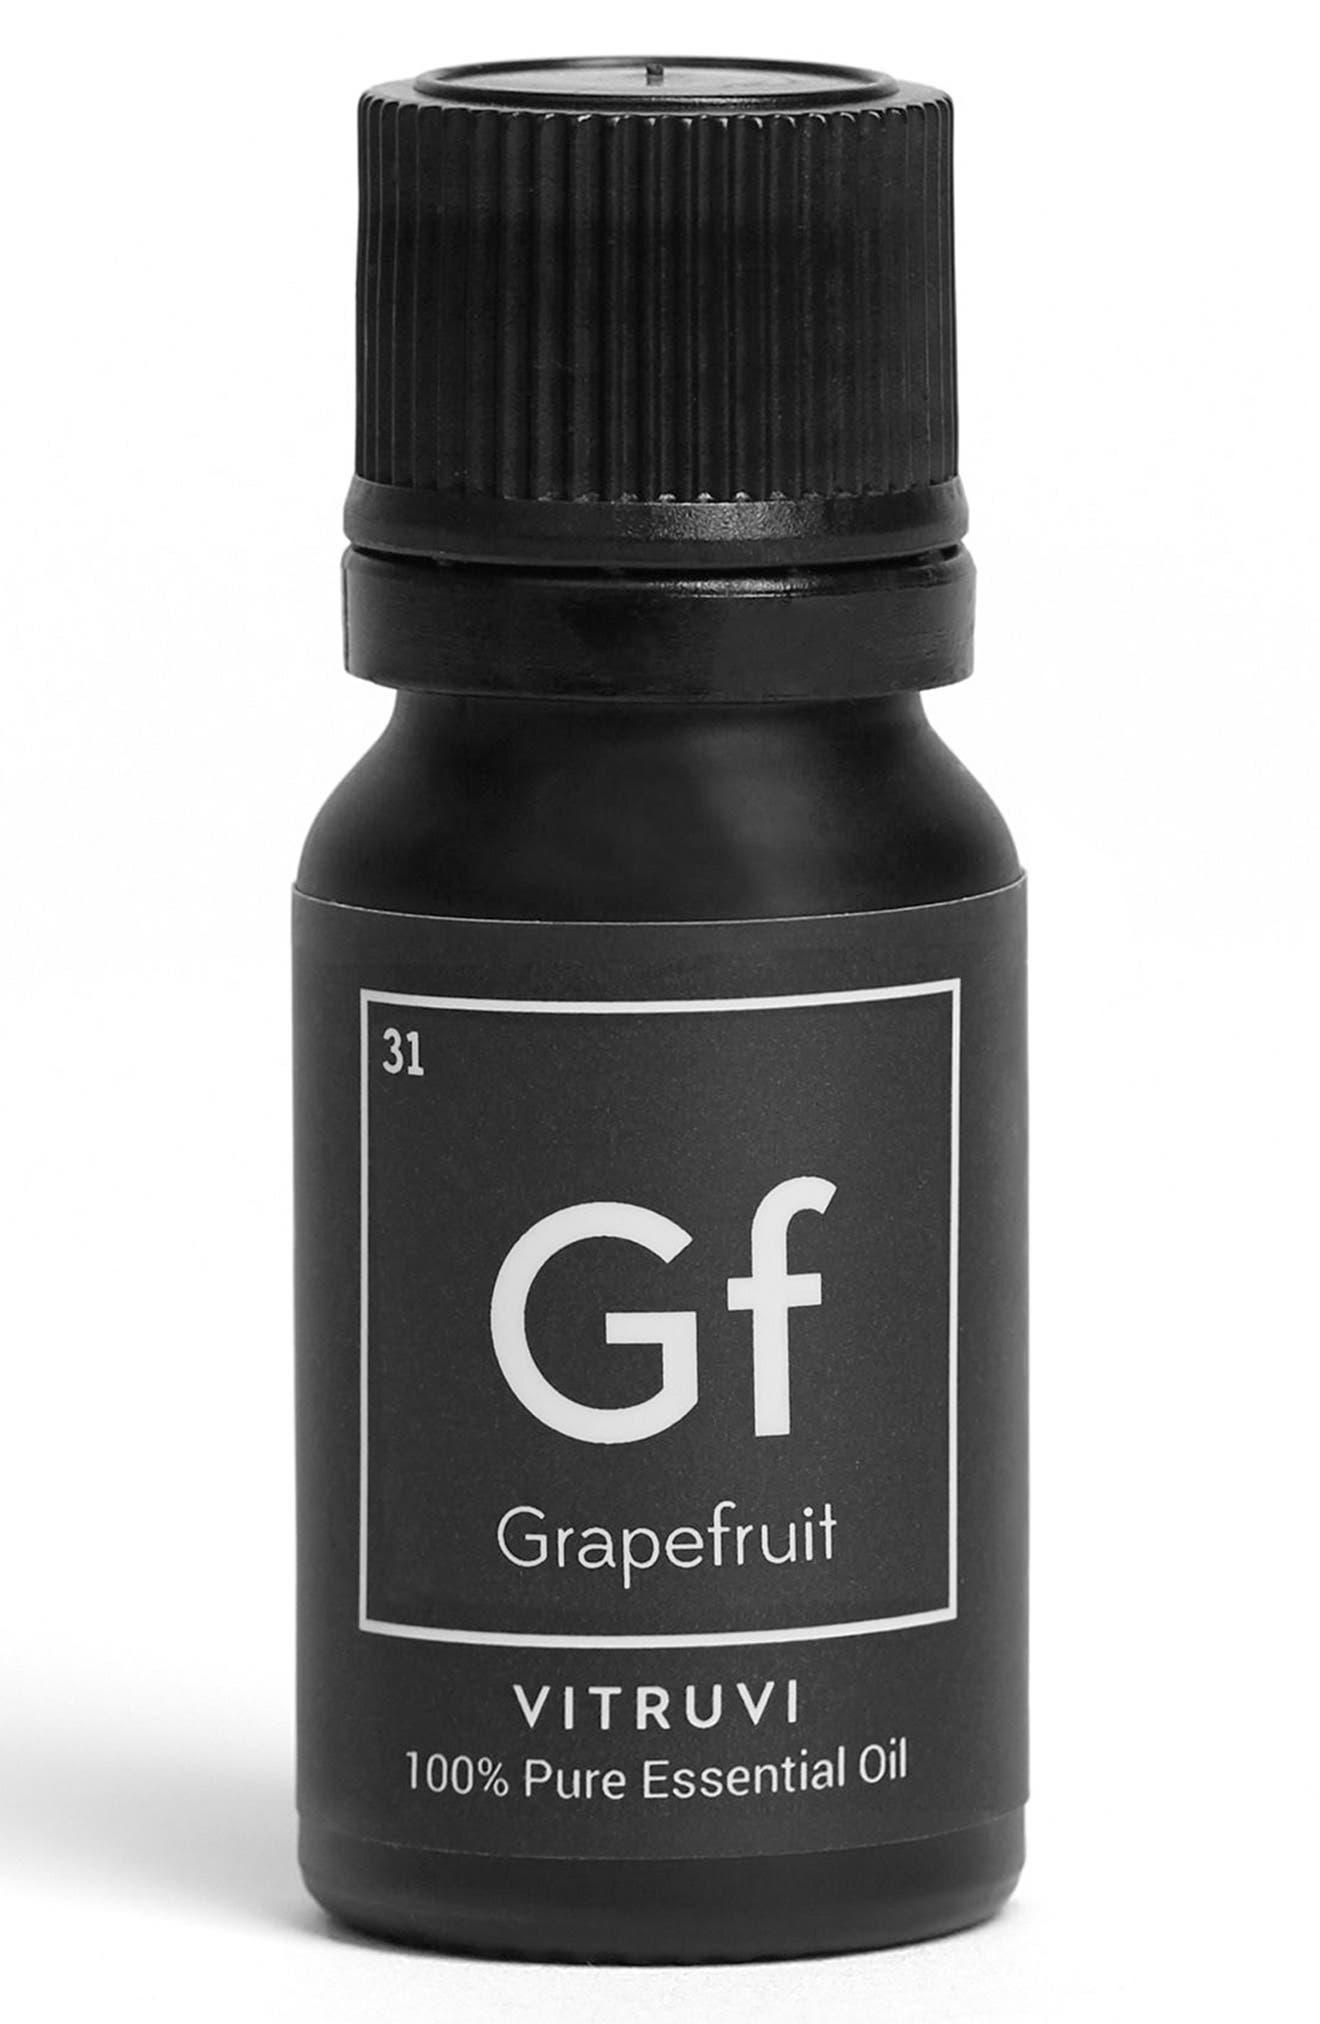 Main Image - Vitruvi Grapefruit Essential Oil